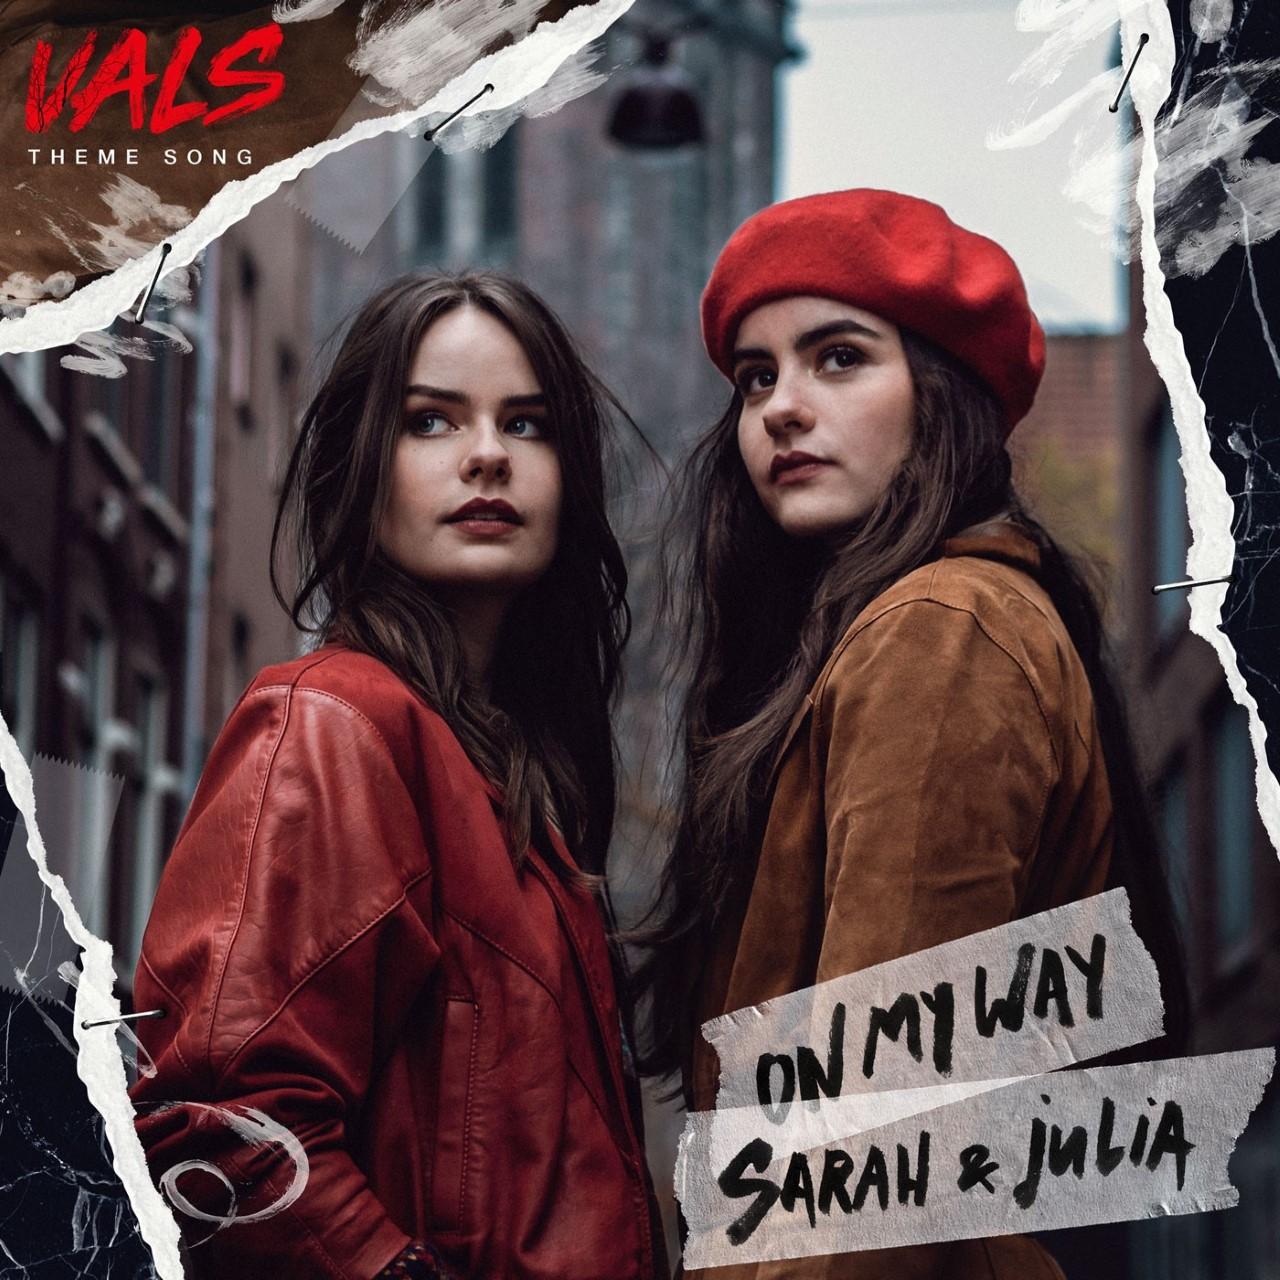 SARAH & JULIA - ON MY WAY (VALS THEME SONG 2019)